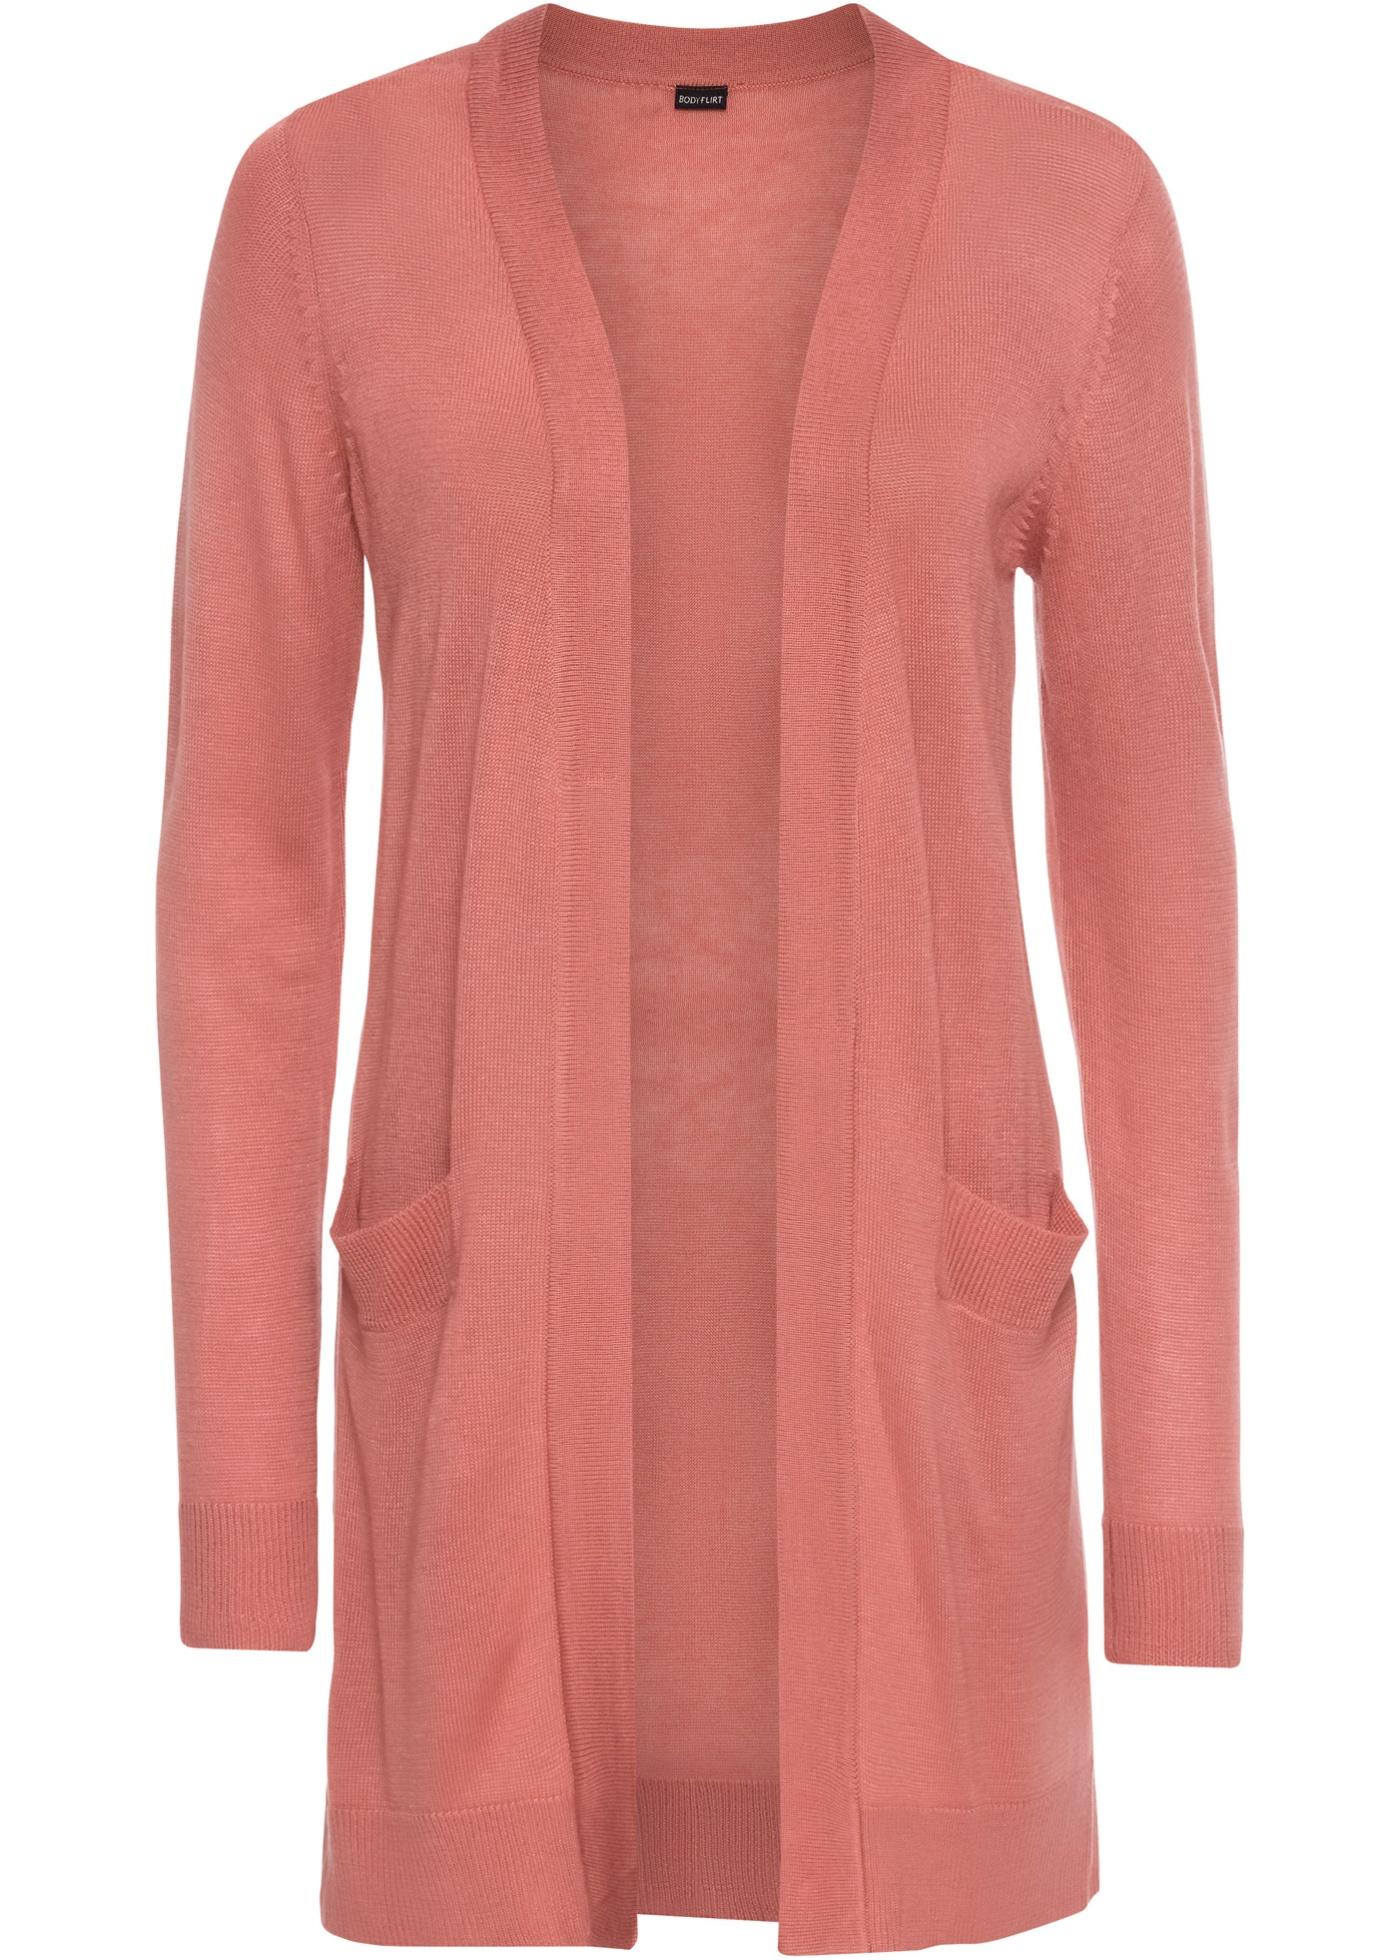 Dlouhý pletený kabátek - Růžová